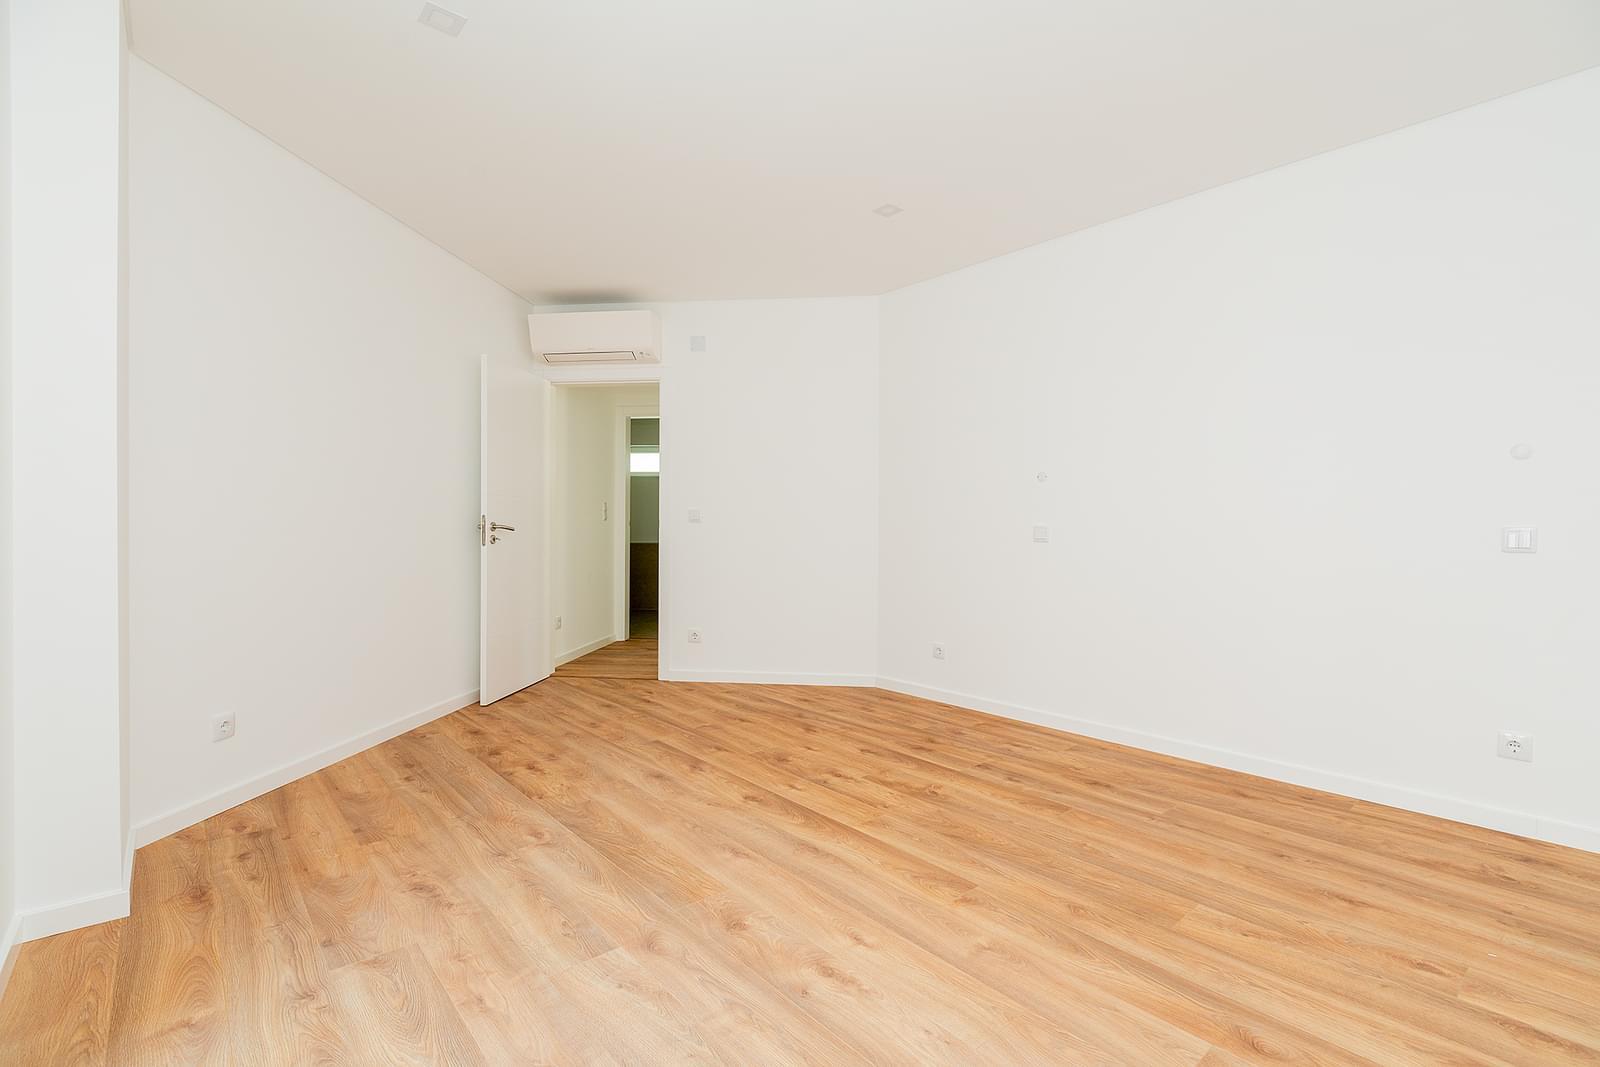 pf16829-apartamento-t1-lisboa-a5f96adb-2d77-4df4-b8f6-a06a5b6eb01a